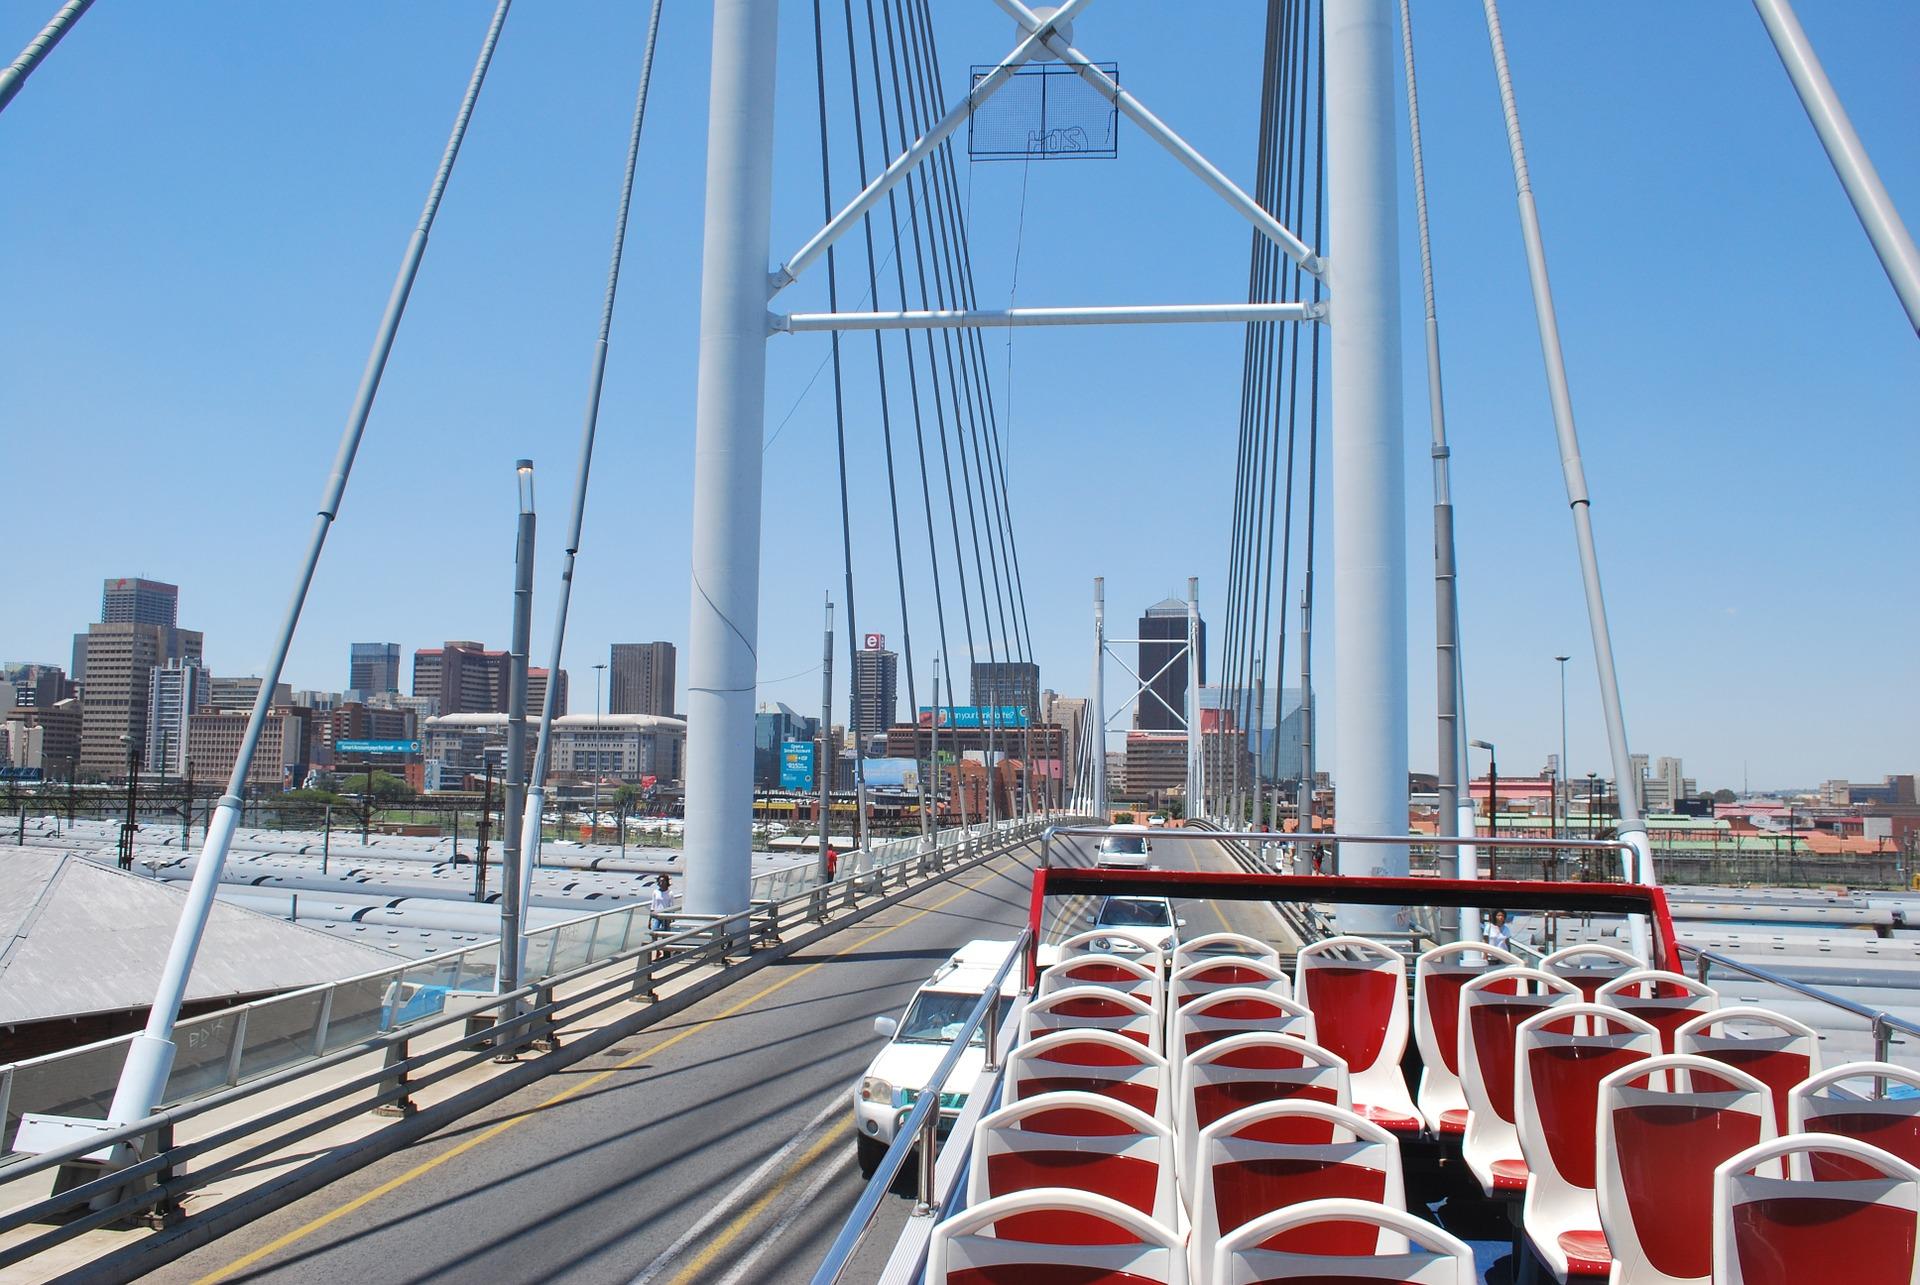 Pixabay – Johannesburg